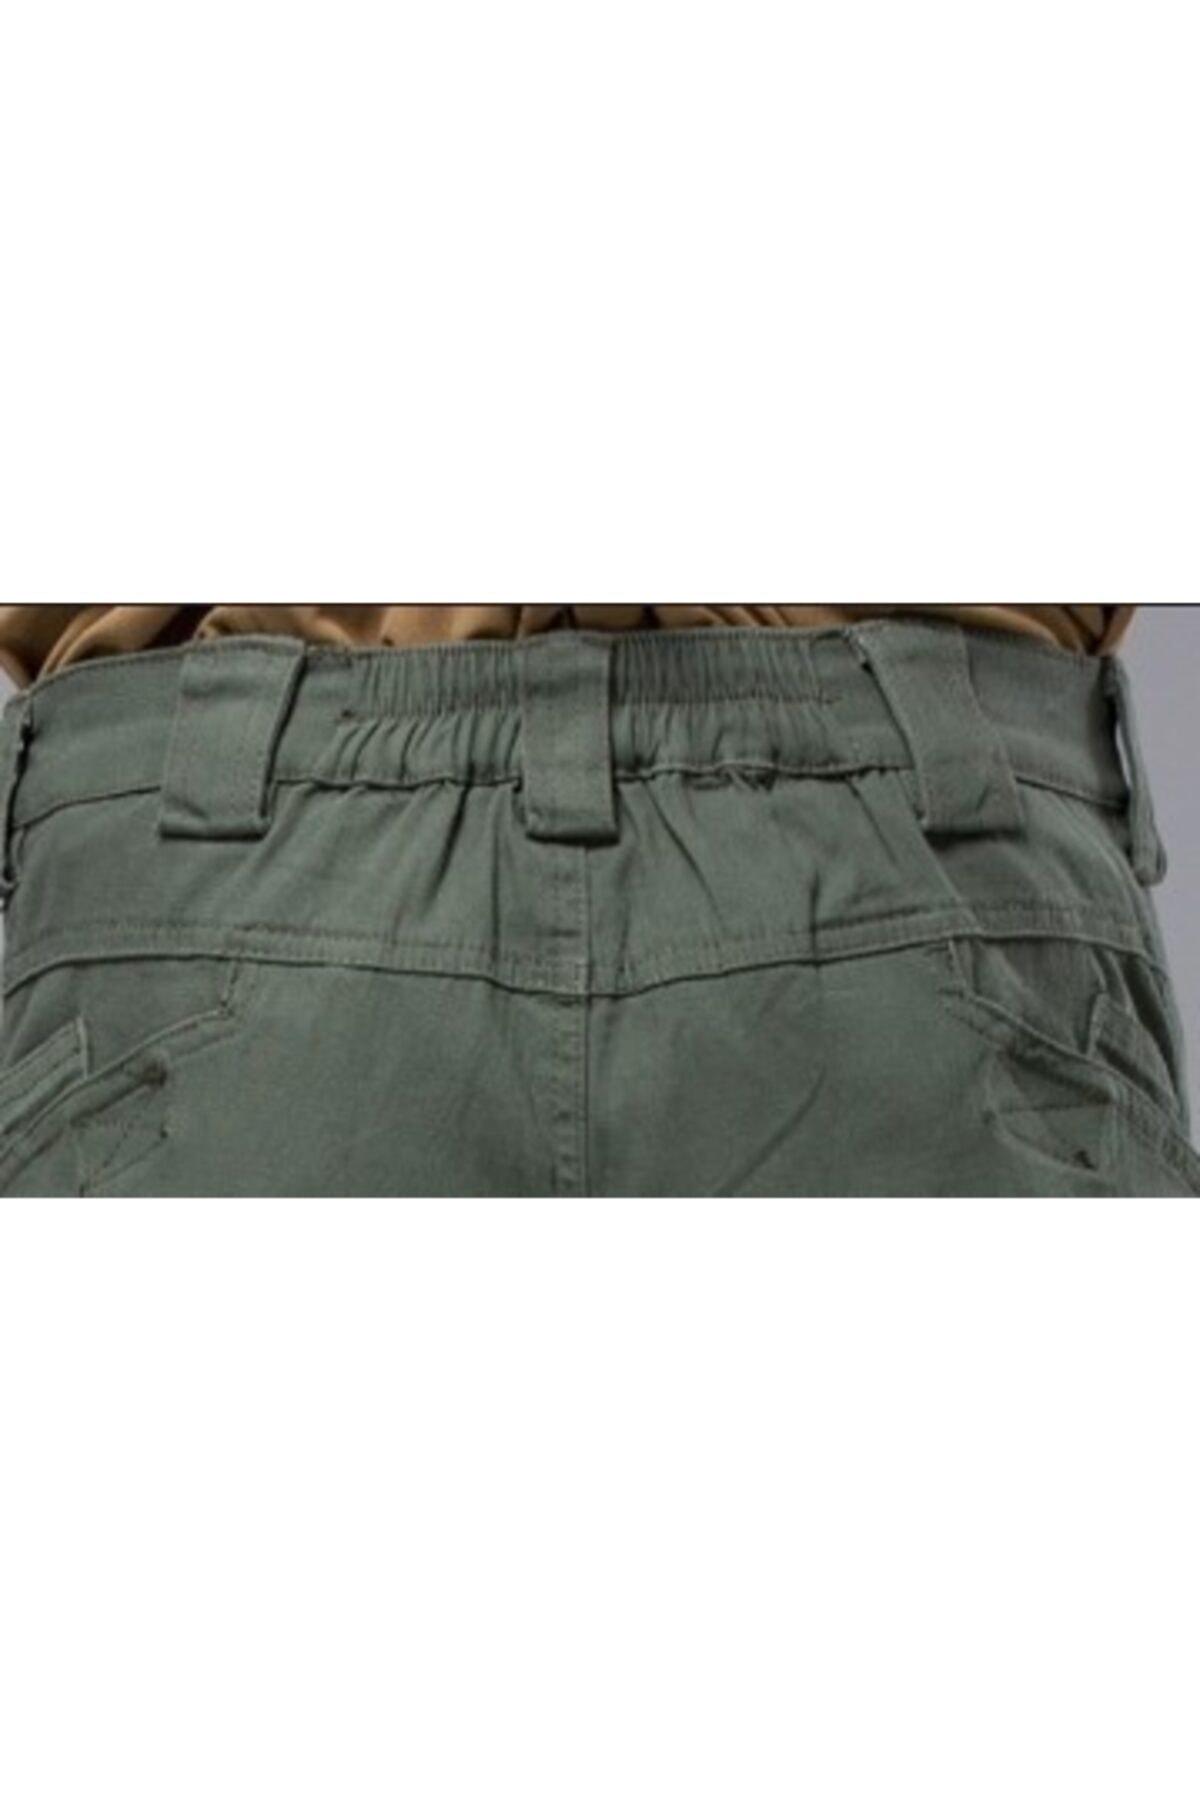 MONTANA TAKTİKAL Erkek Haki Yeşil Model Tactical Pantolon *32x32* 2